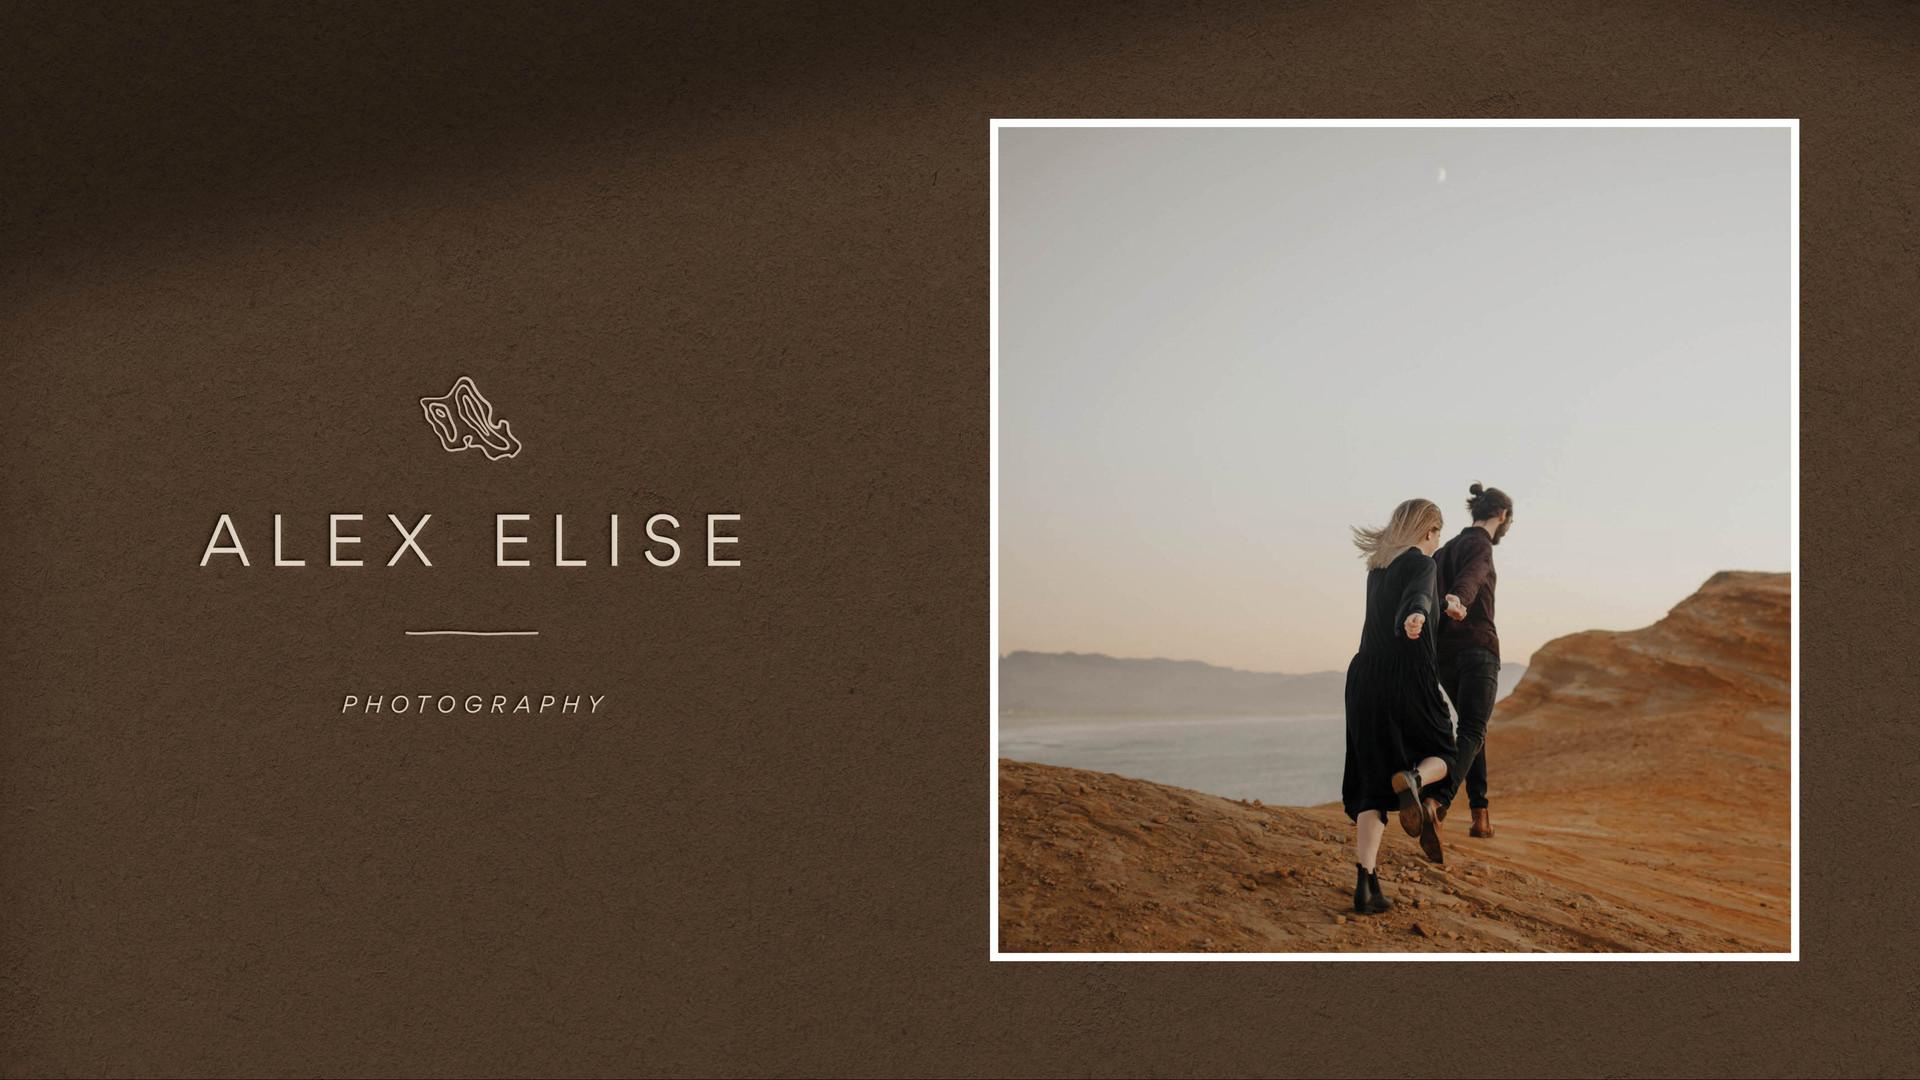 alex elise photography design